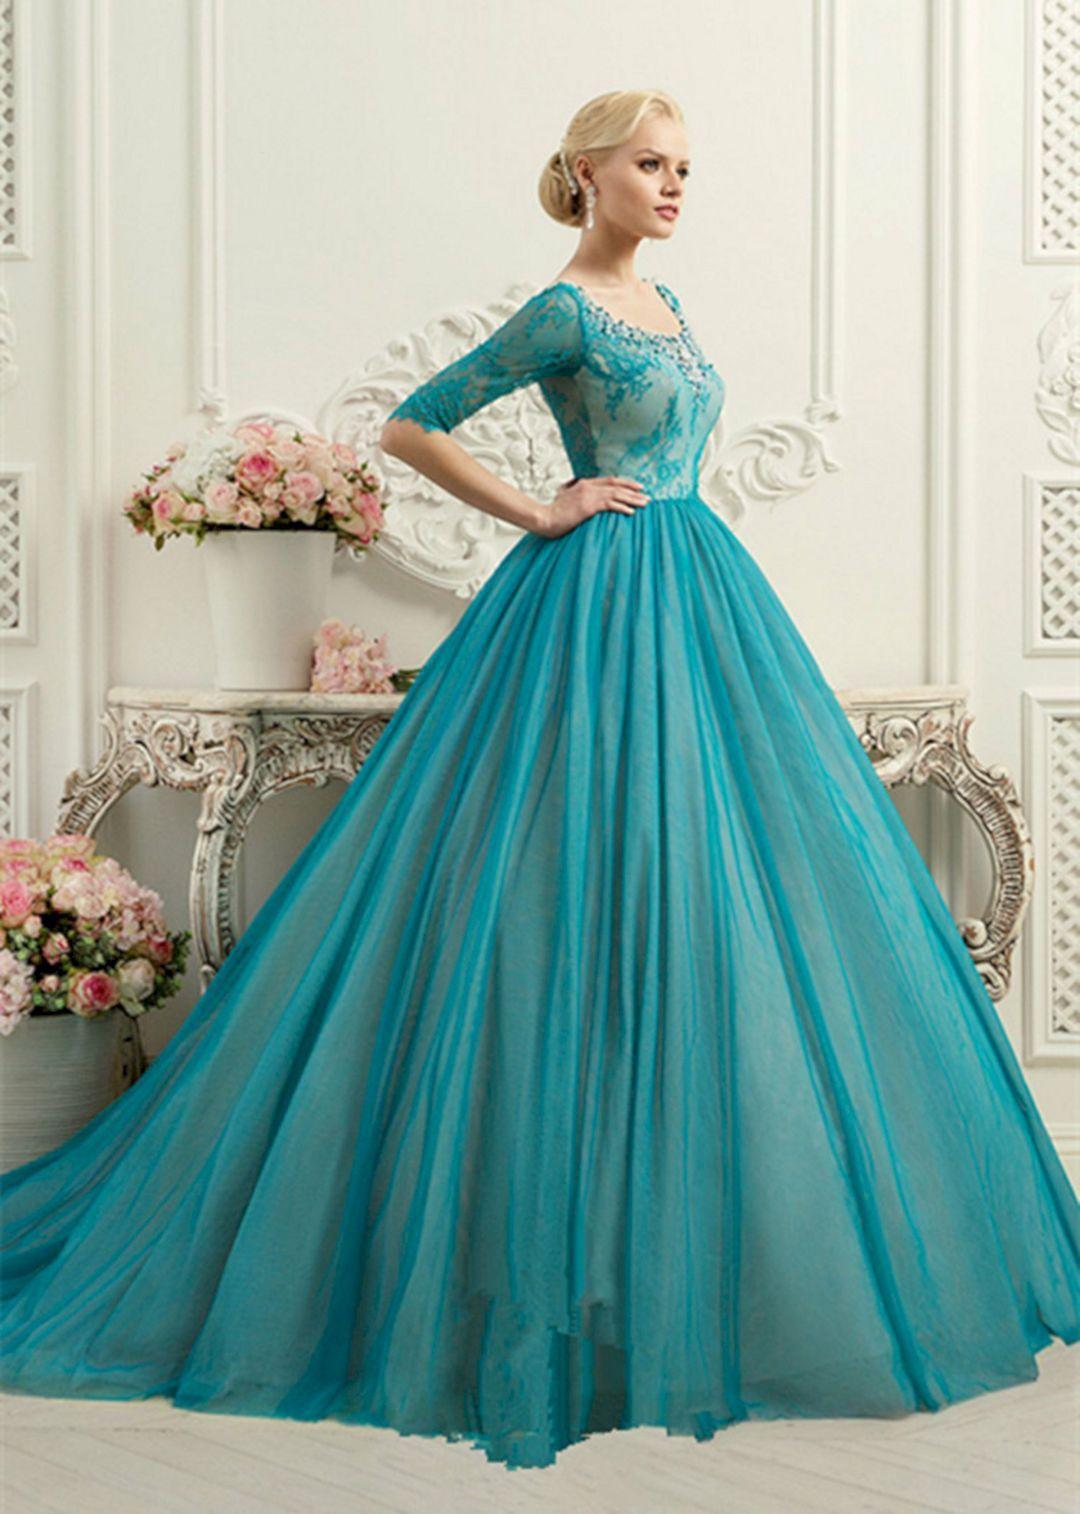 20 marvelous blue wedding dress that look more beautiful